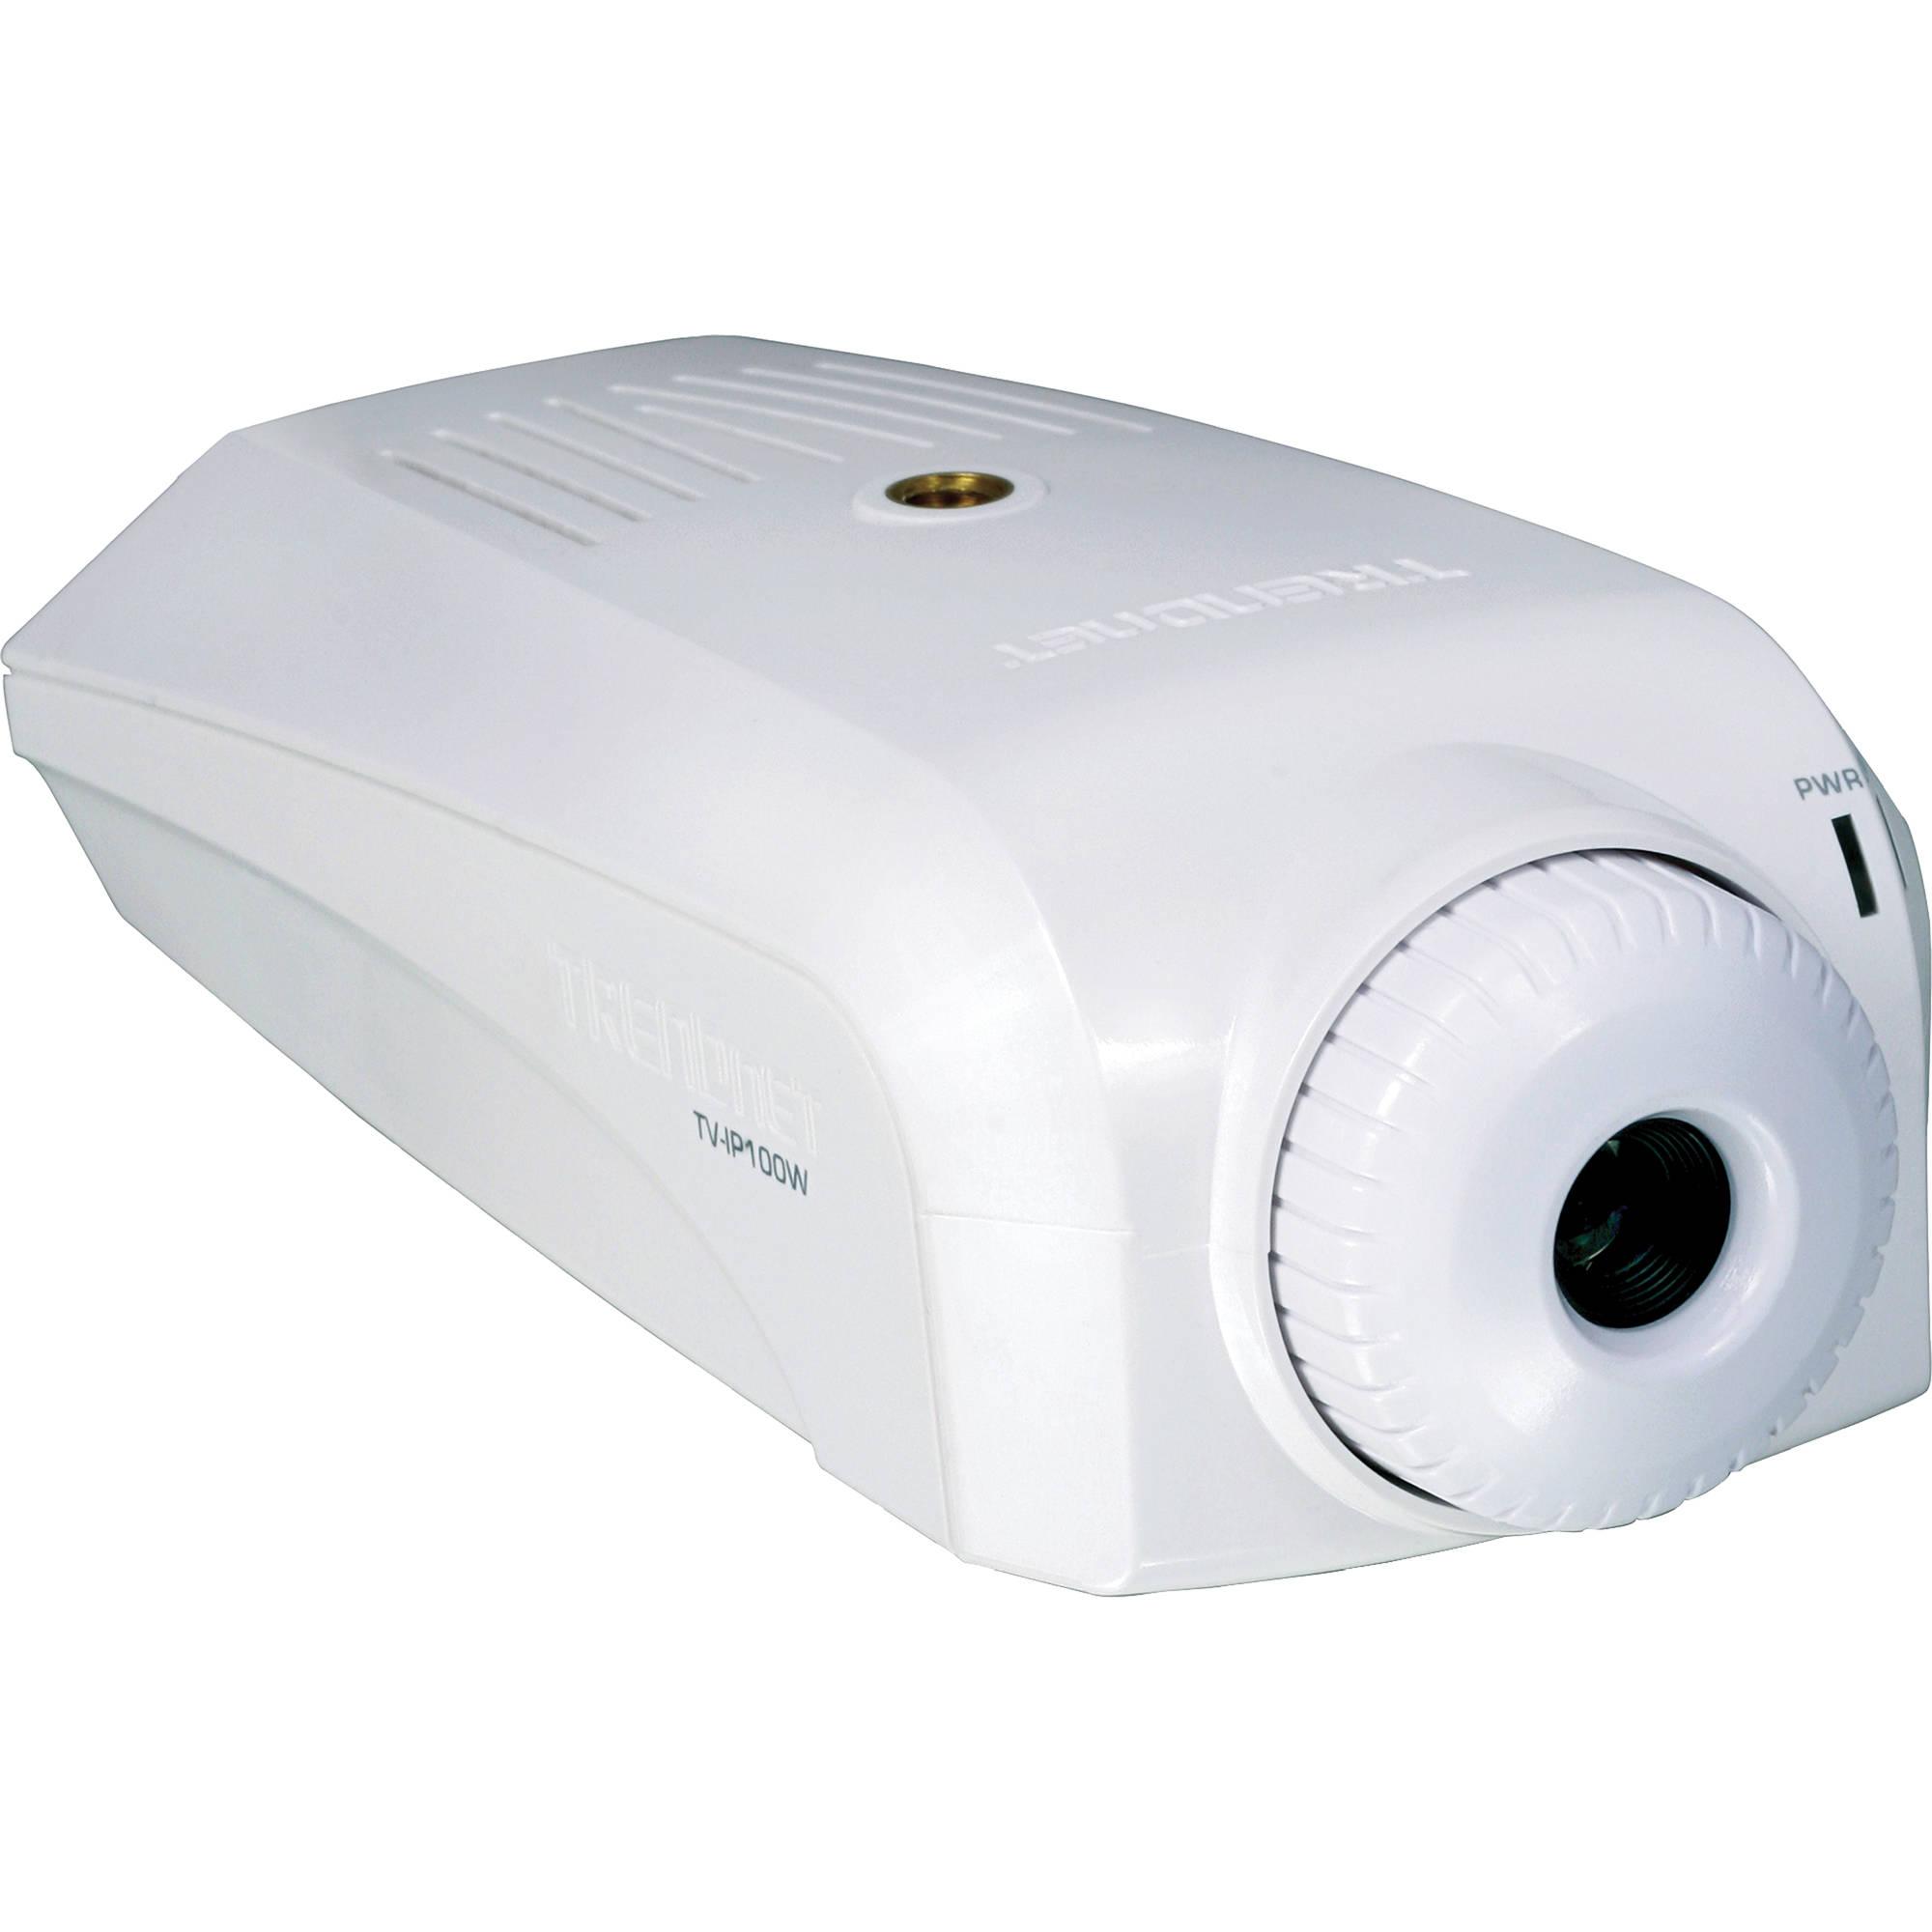 TRENDnet TV-IP100 Internet Camera Server Driver PC